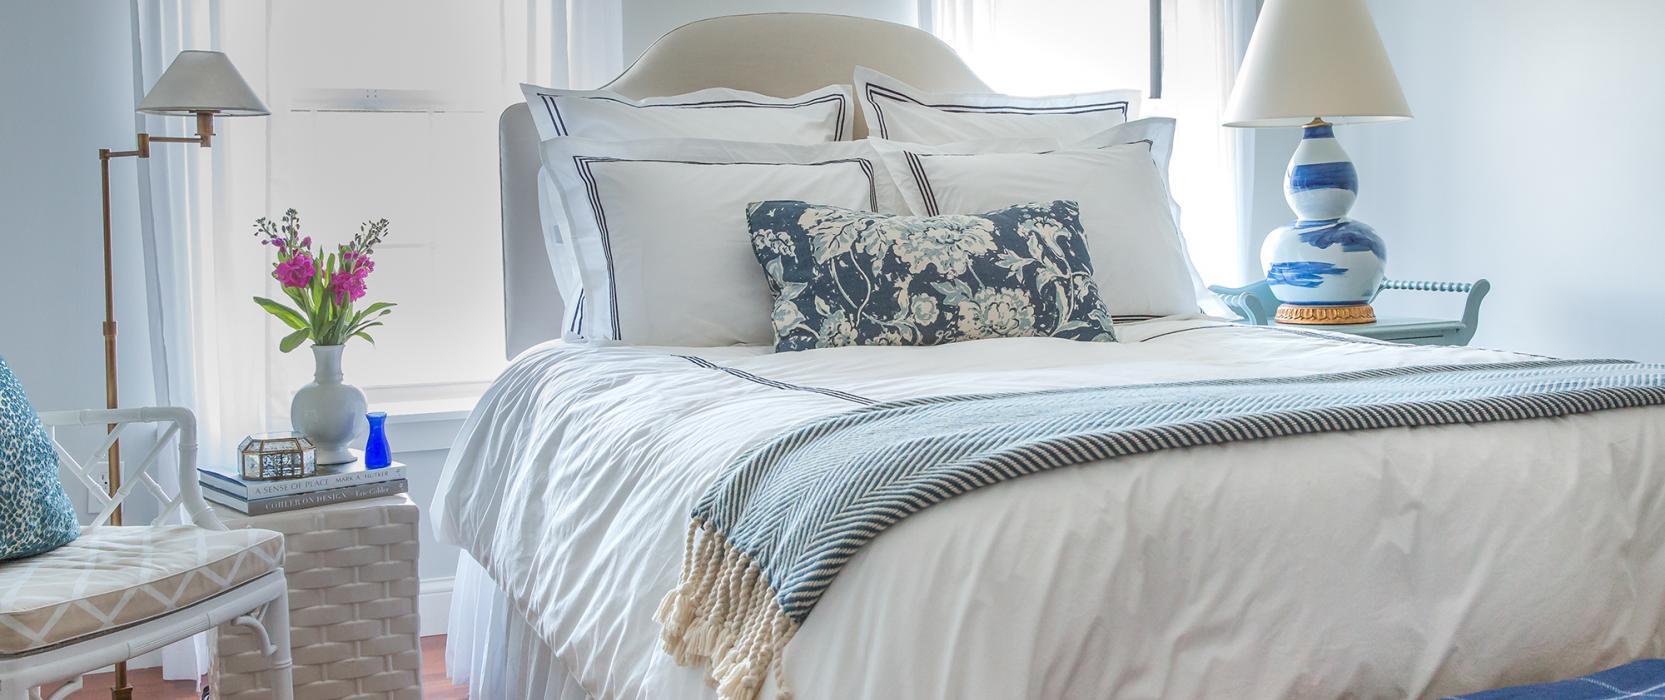 Downy, breezy bedroom